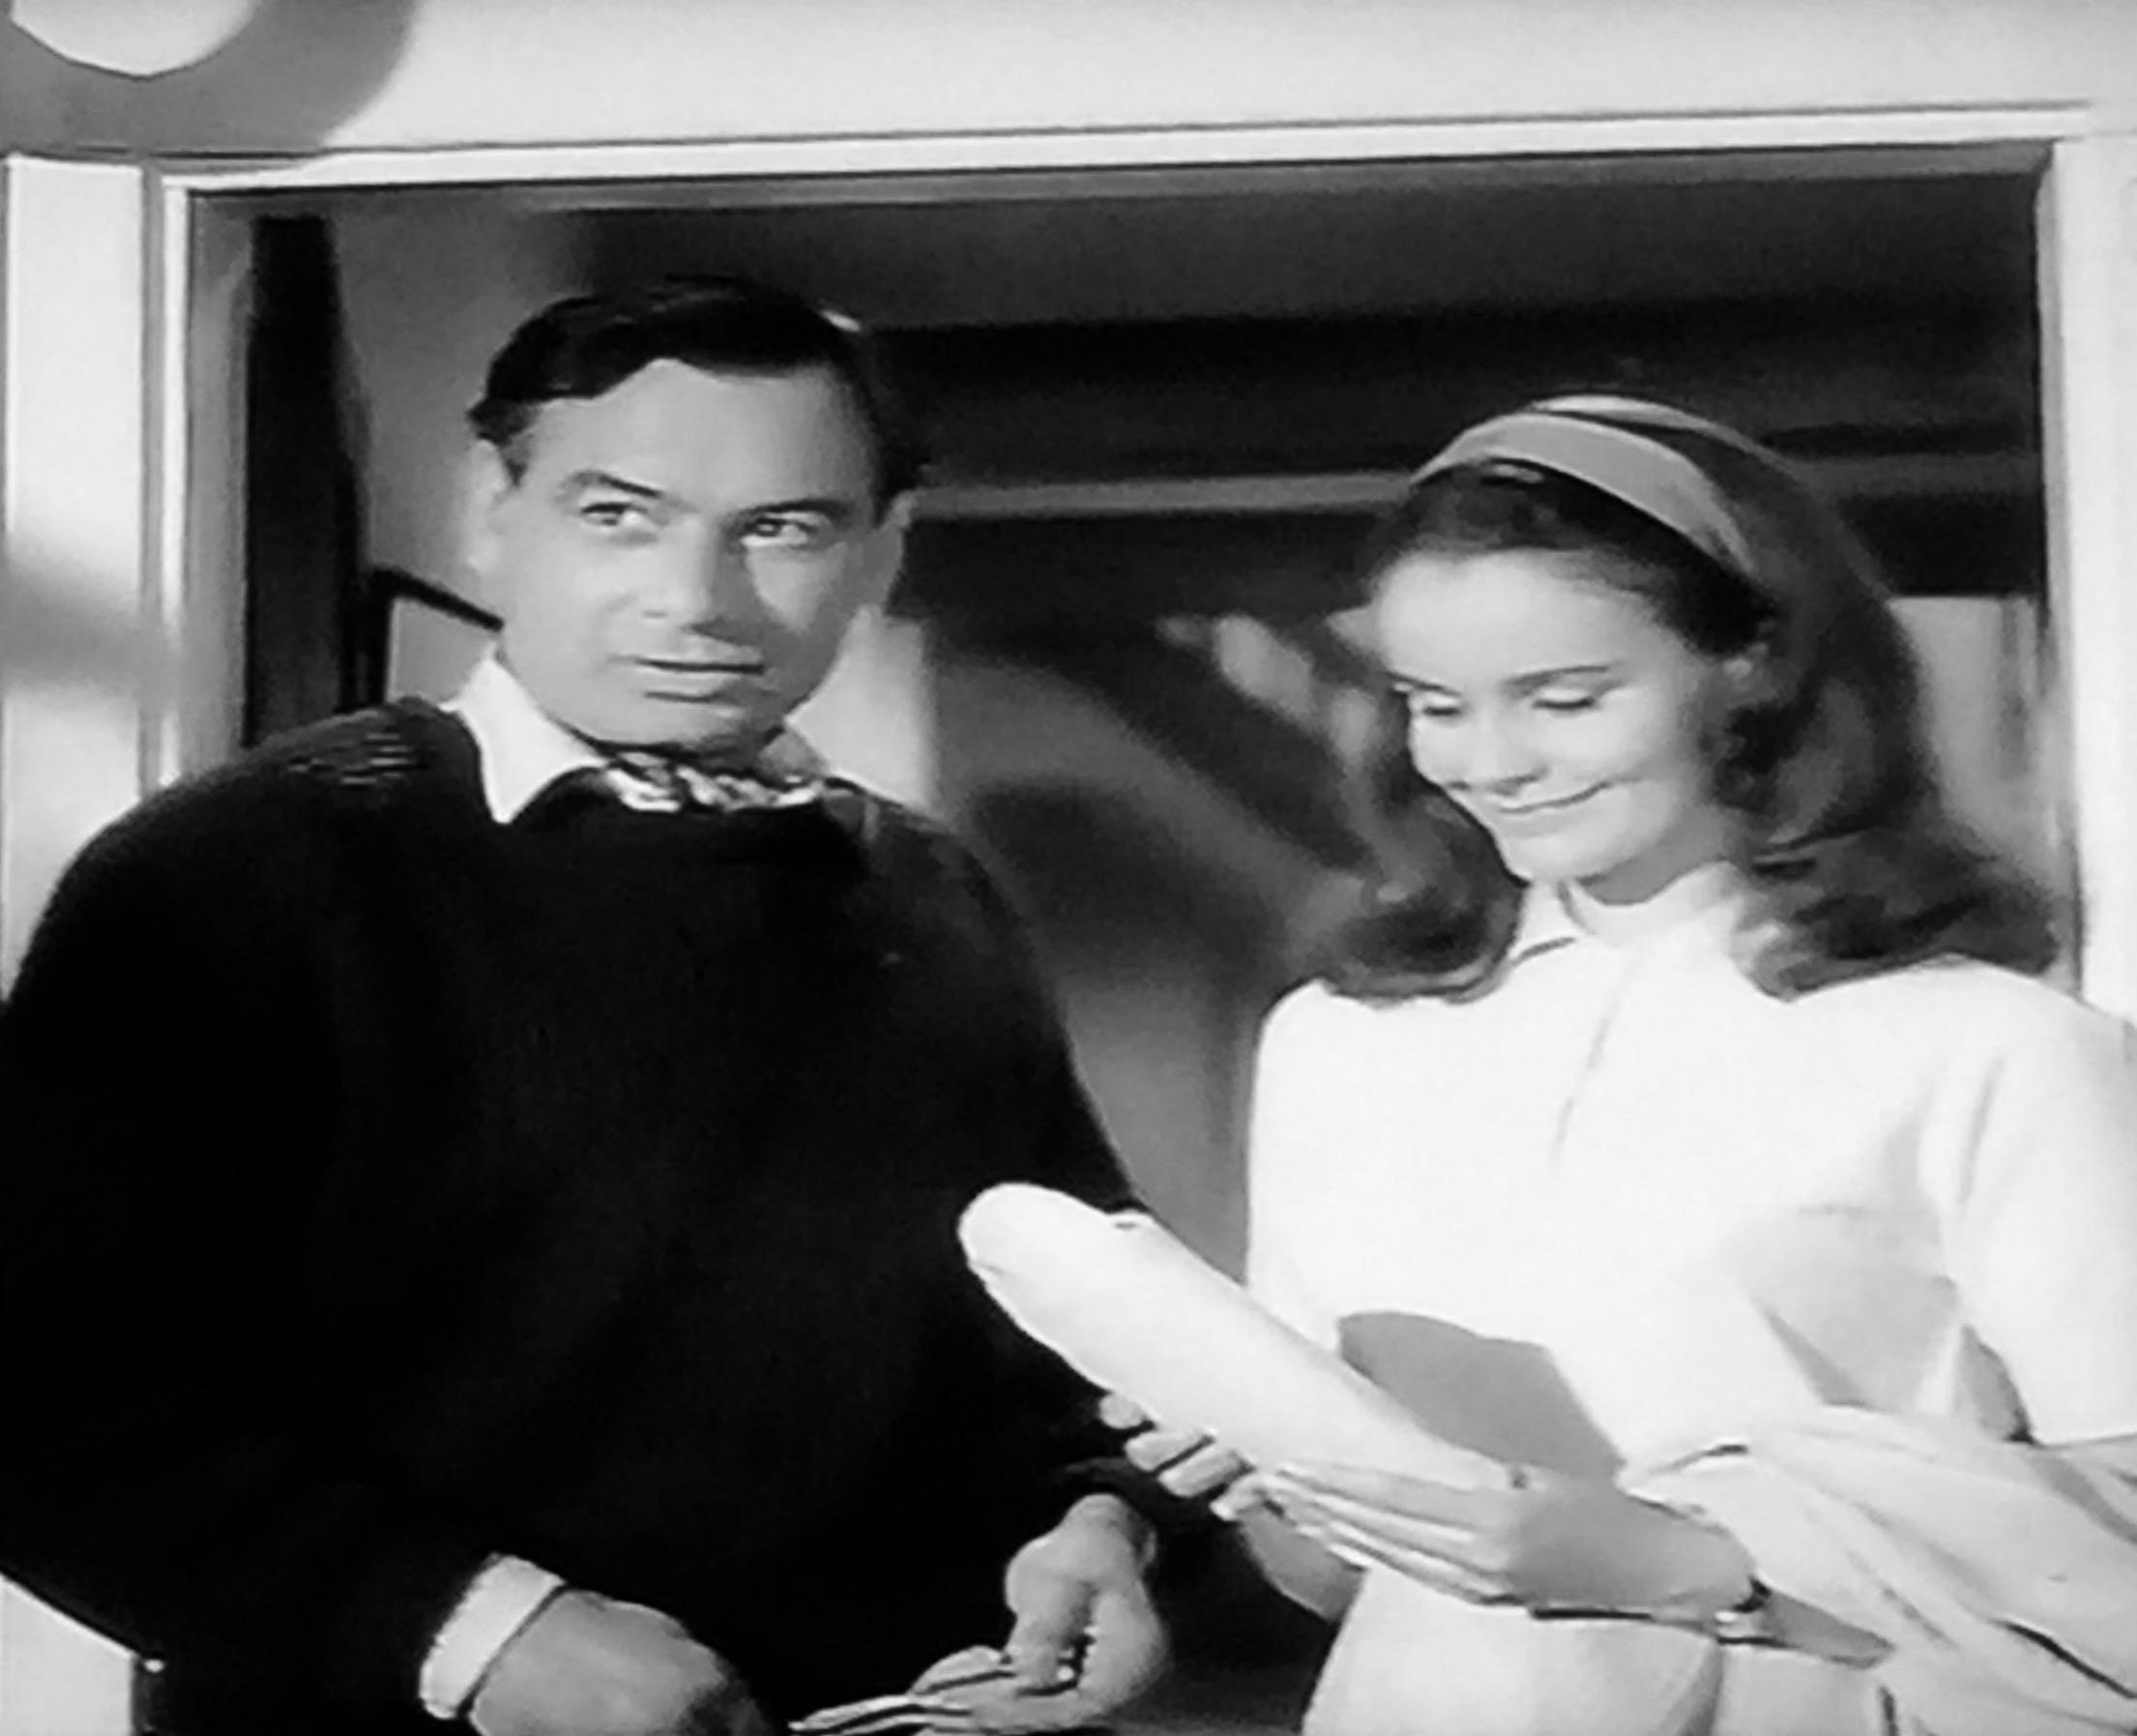 Christina Gregg and Conrad Phillips in Don't Talk to Strange Men (1962)